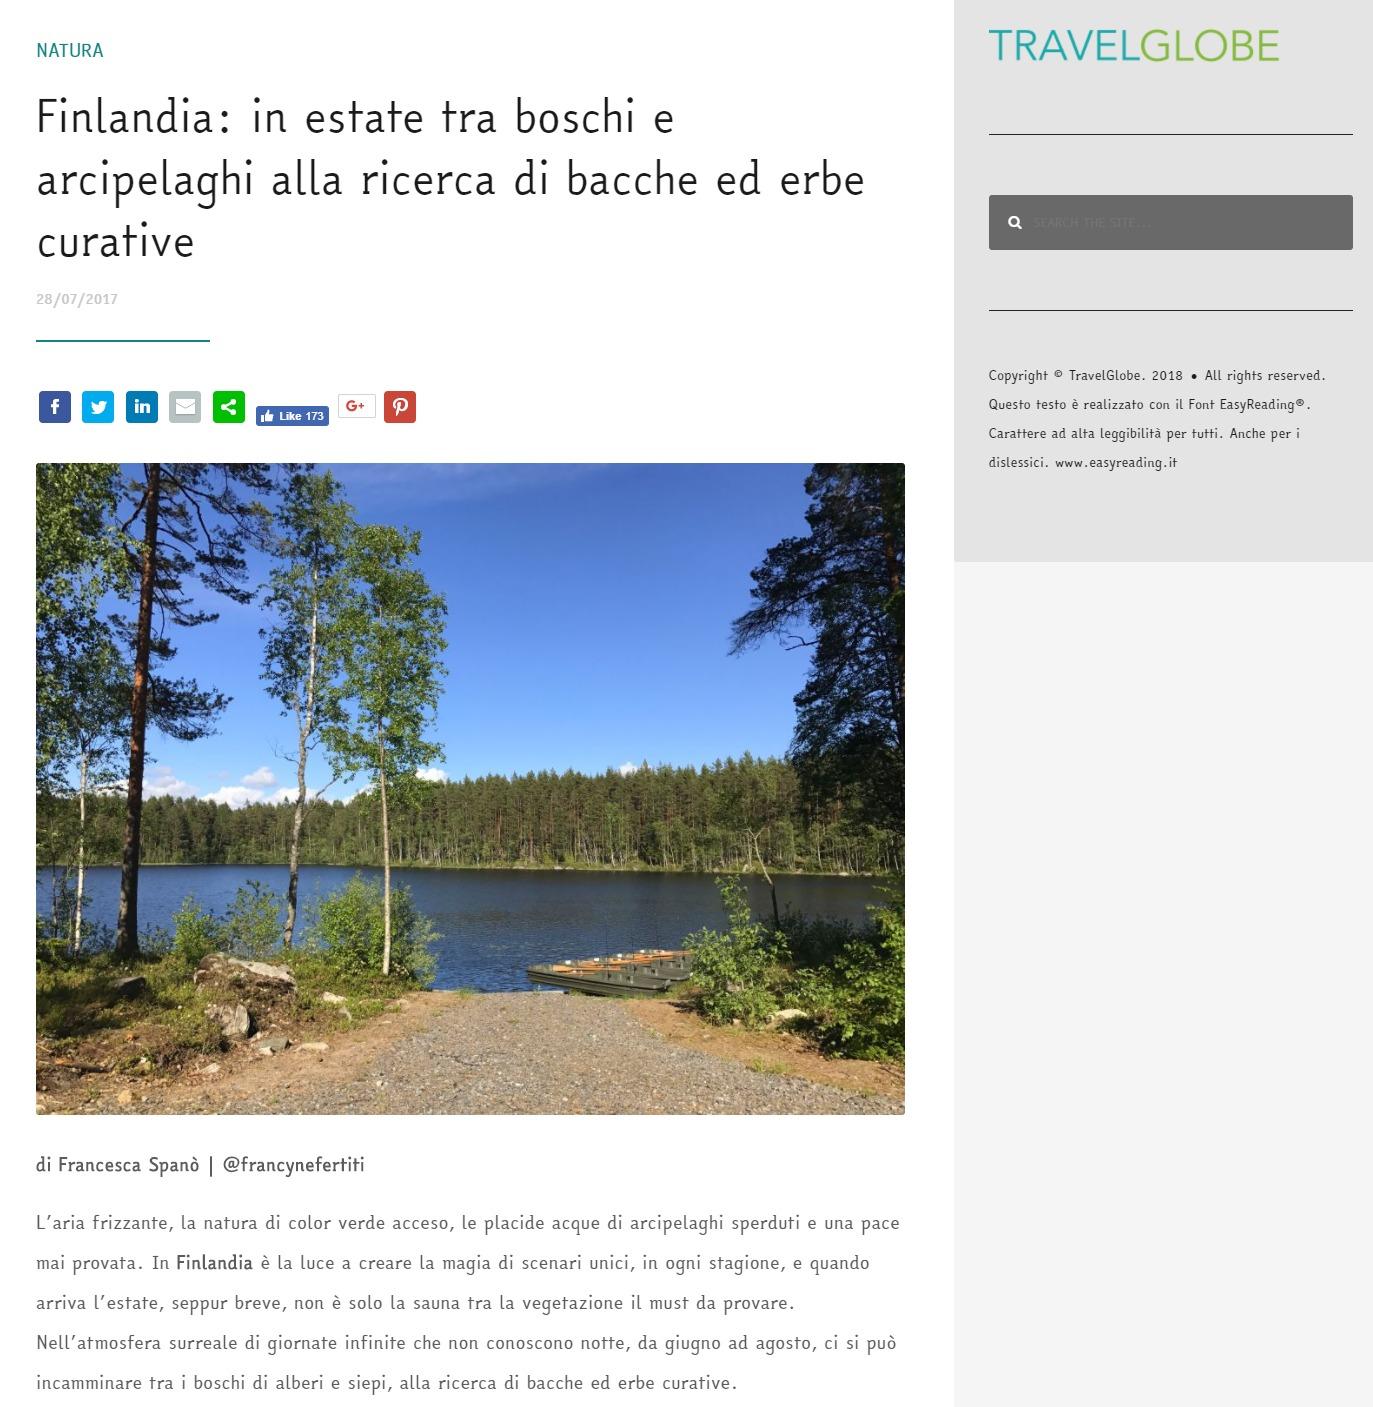 Travelglobe – Finlandia